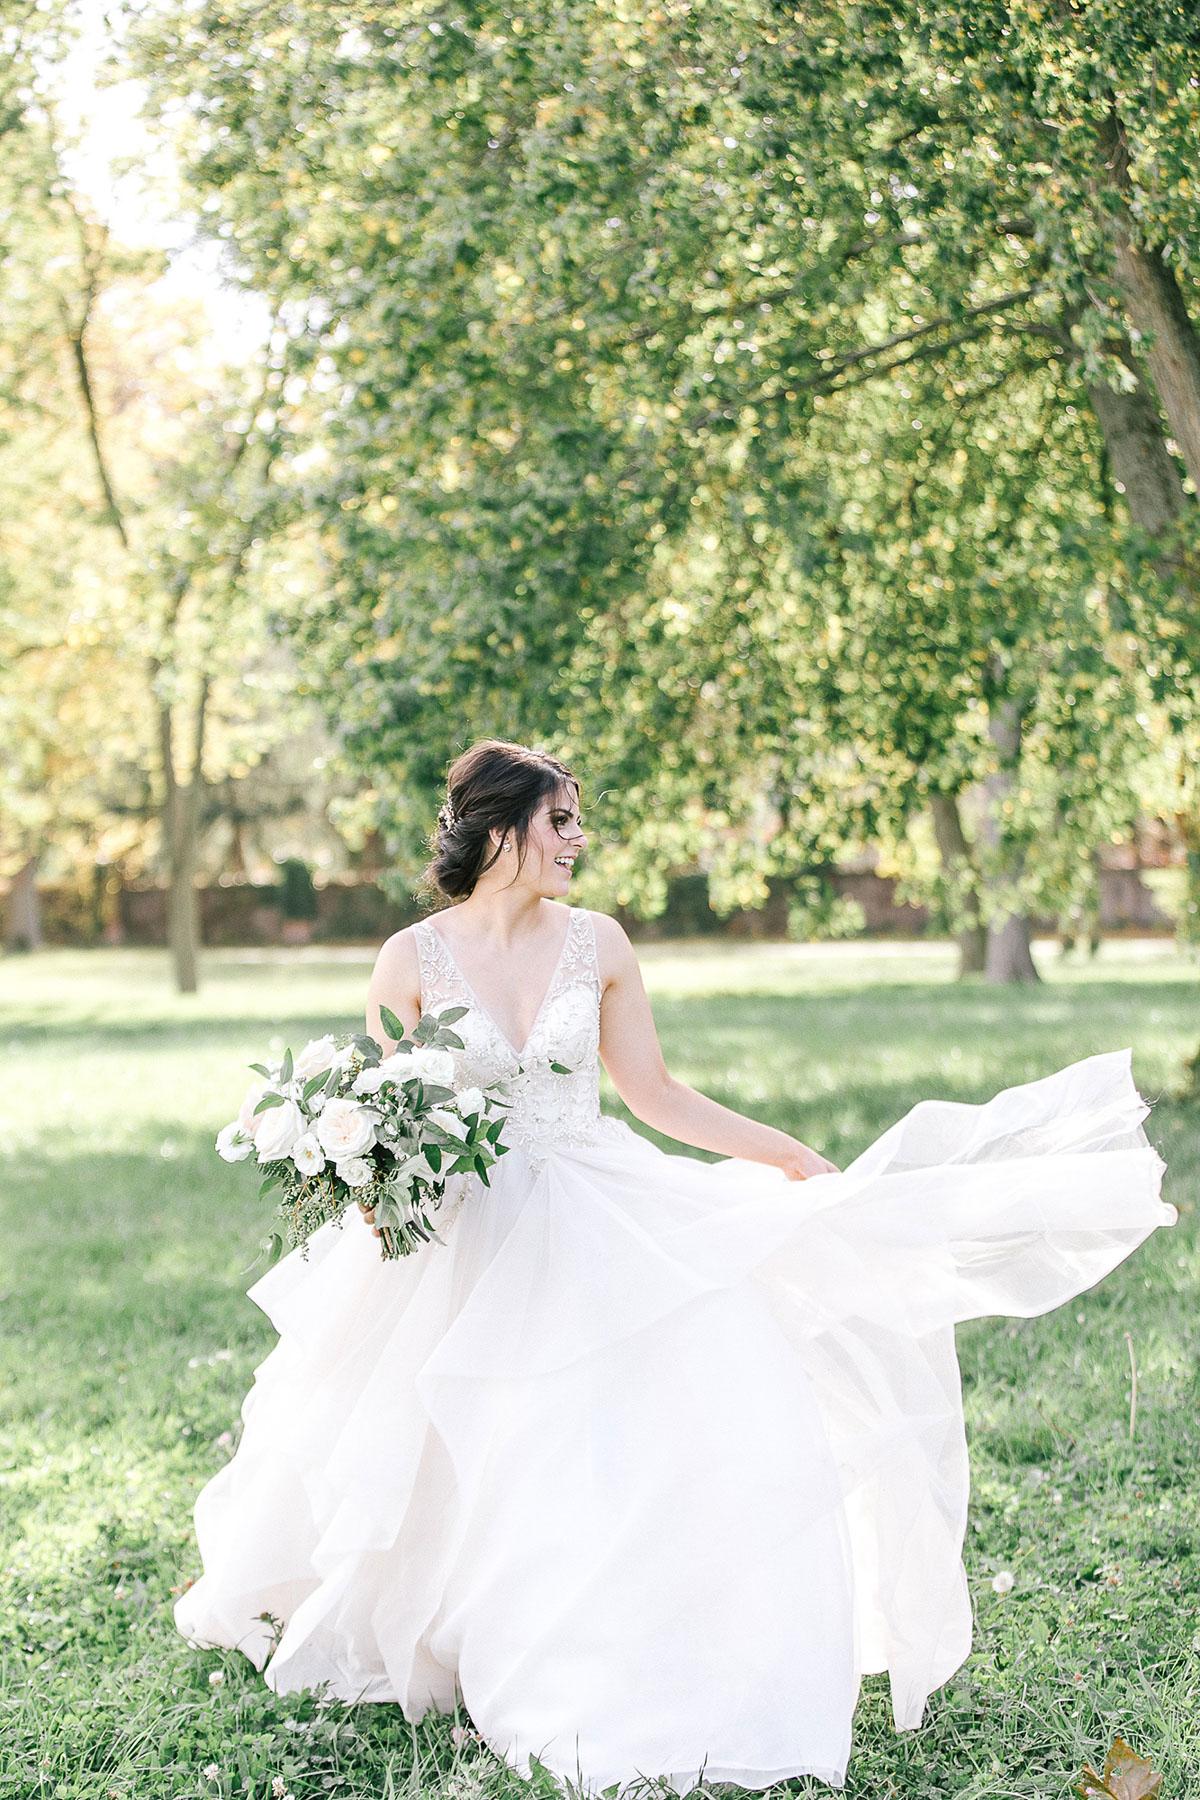 tamara-lockwood-photography-vineyard-bride-swish-list-the-old-courthouse-niagara-on-the-lake-wedding-29.jpg